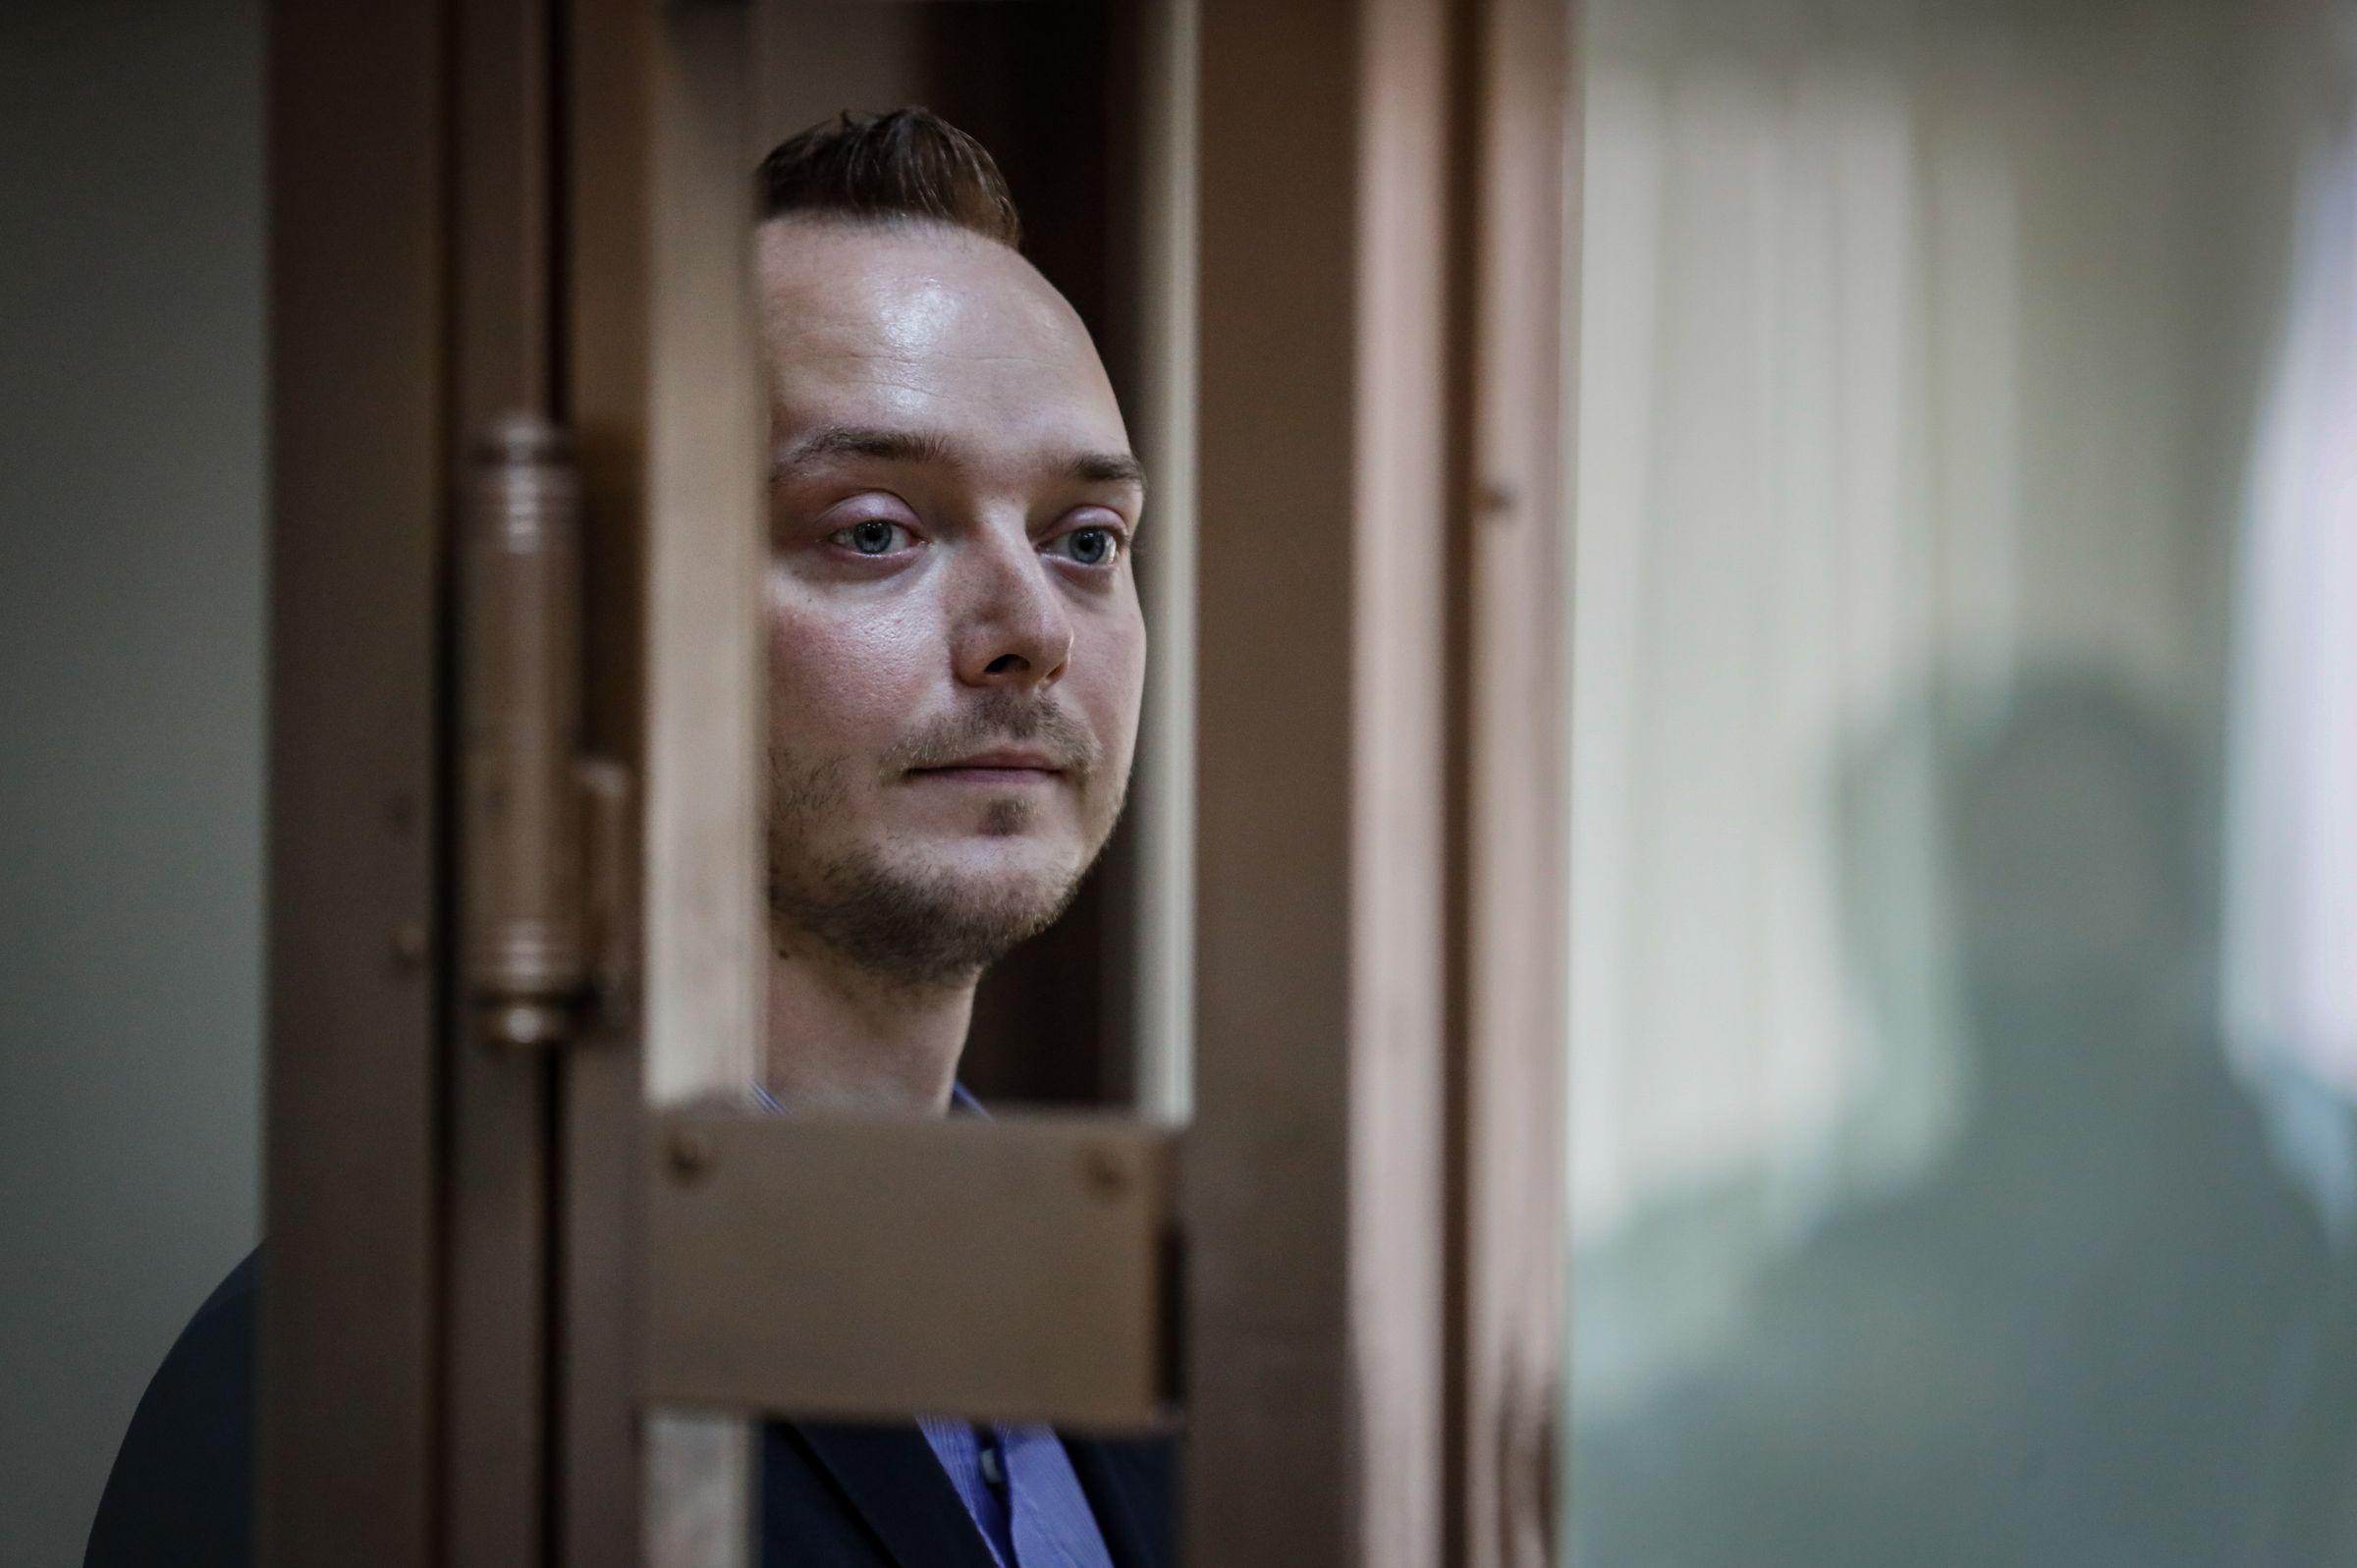 Путин  о деле Ивана Сафронова: Решение примет суд